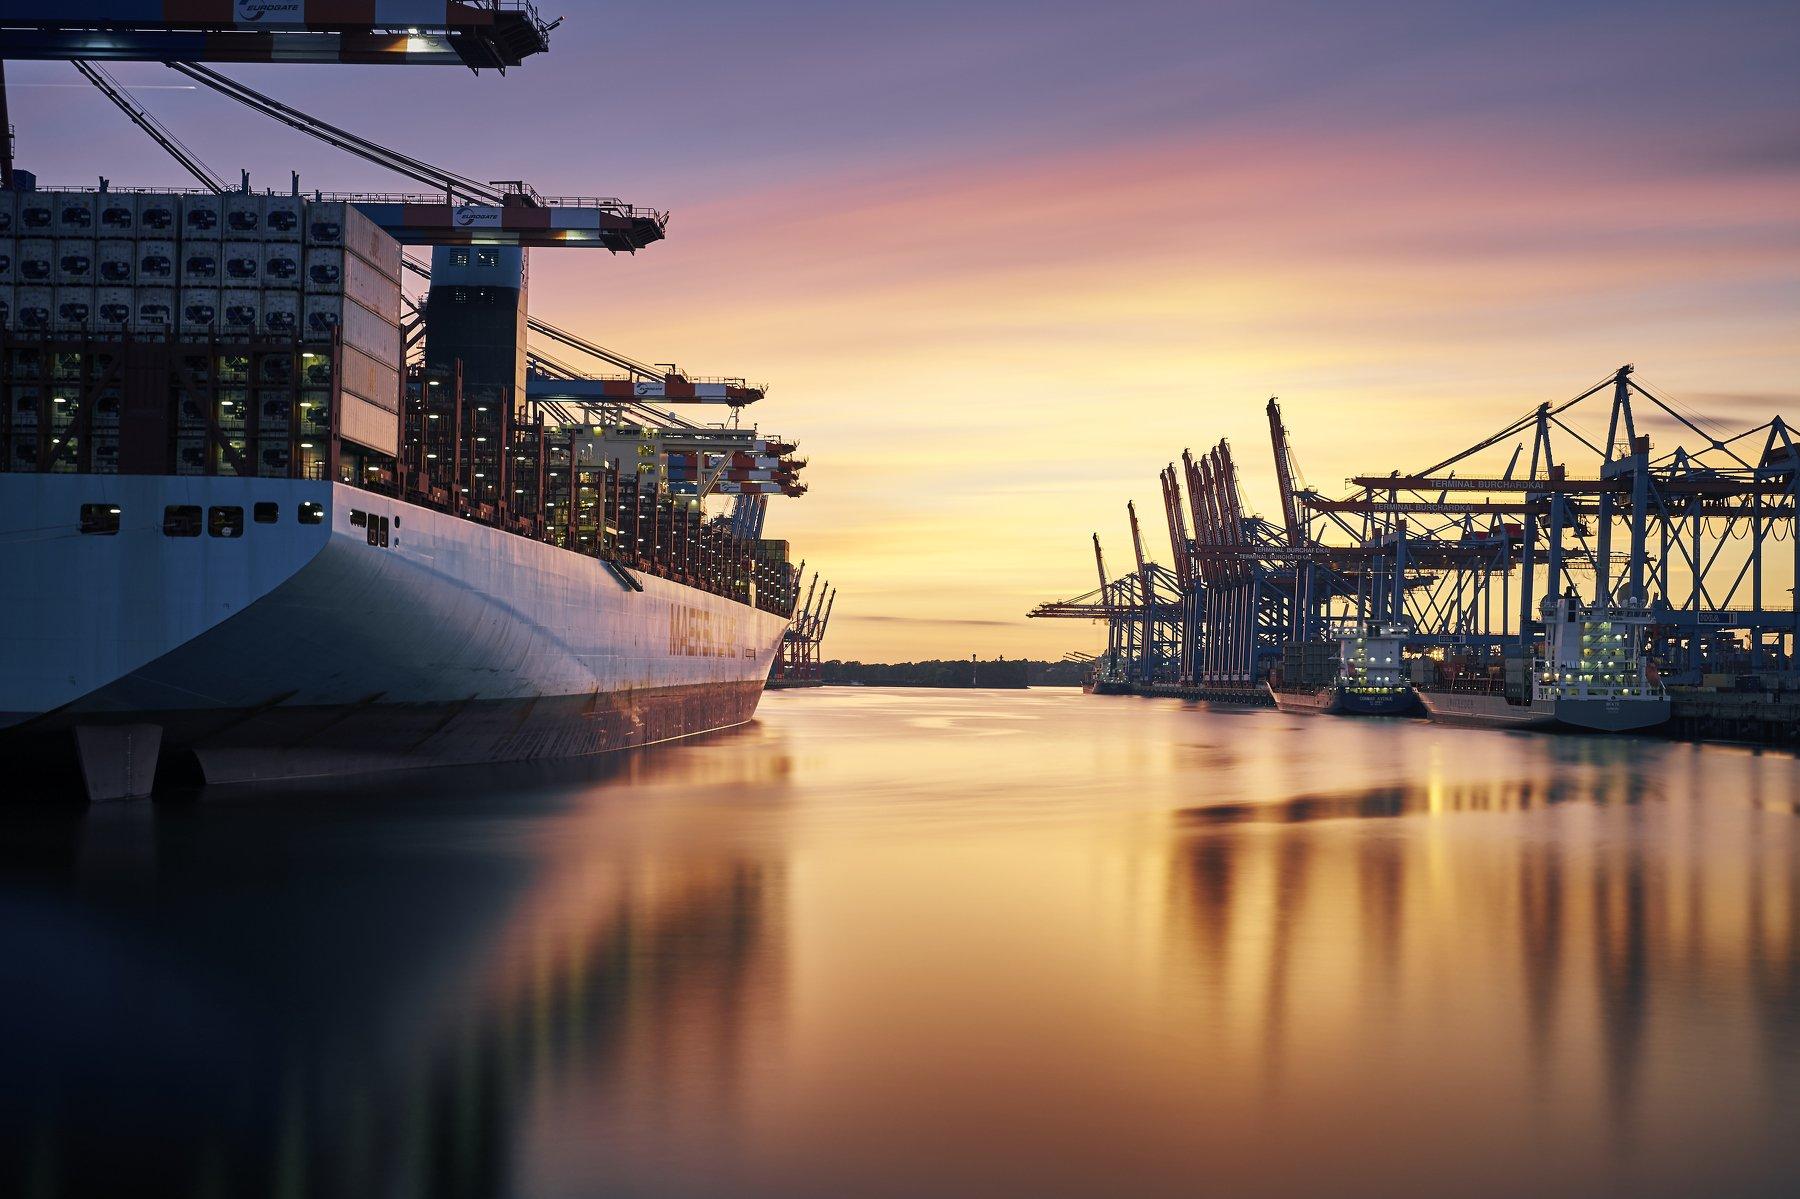 harbour, port, ships, water, elbe, Waltershof, lights, sunset, sky, clouds, container, Schönberg Alexander